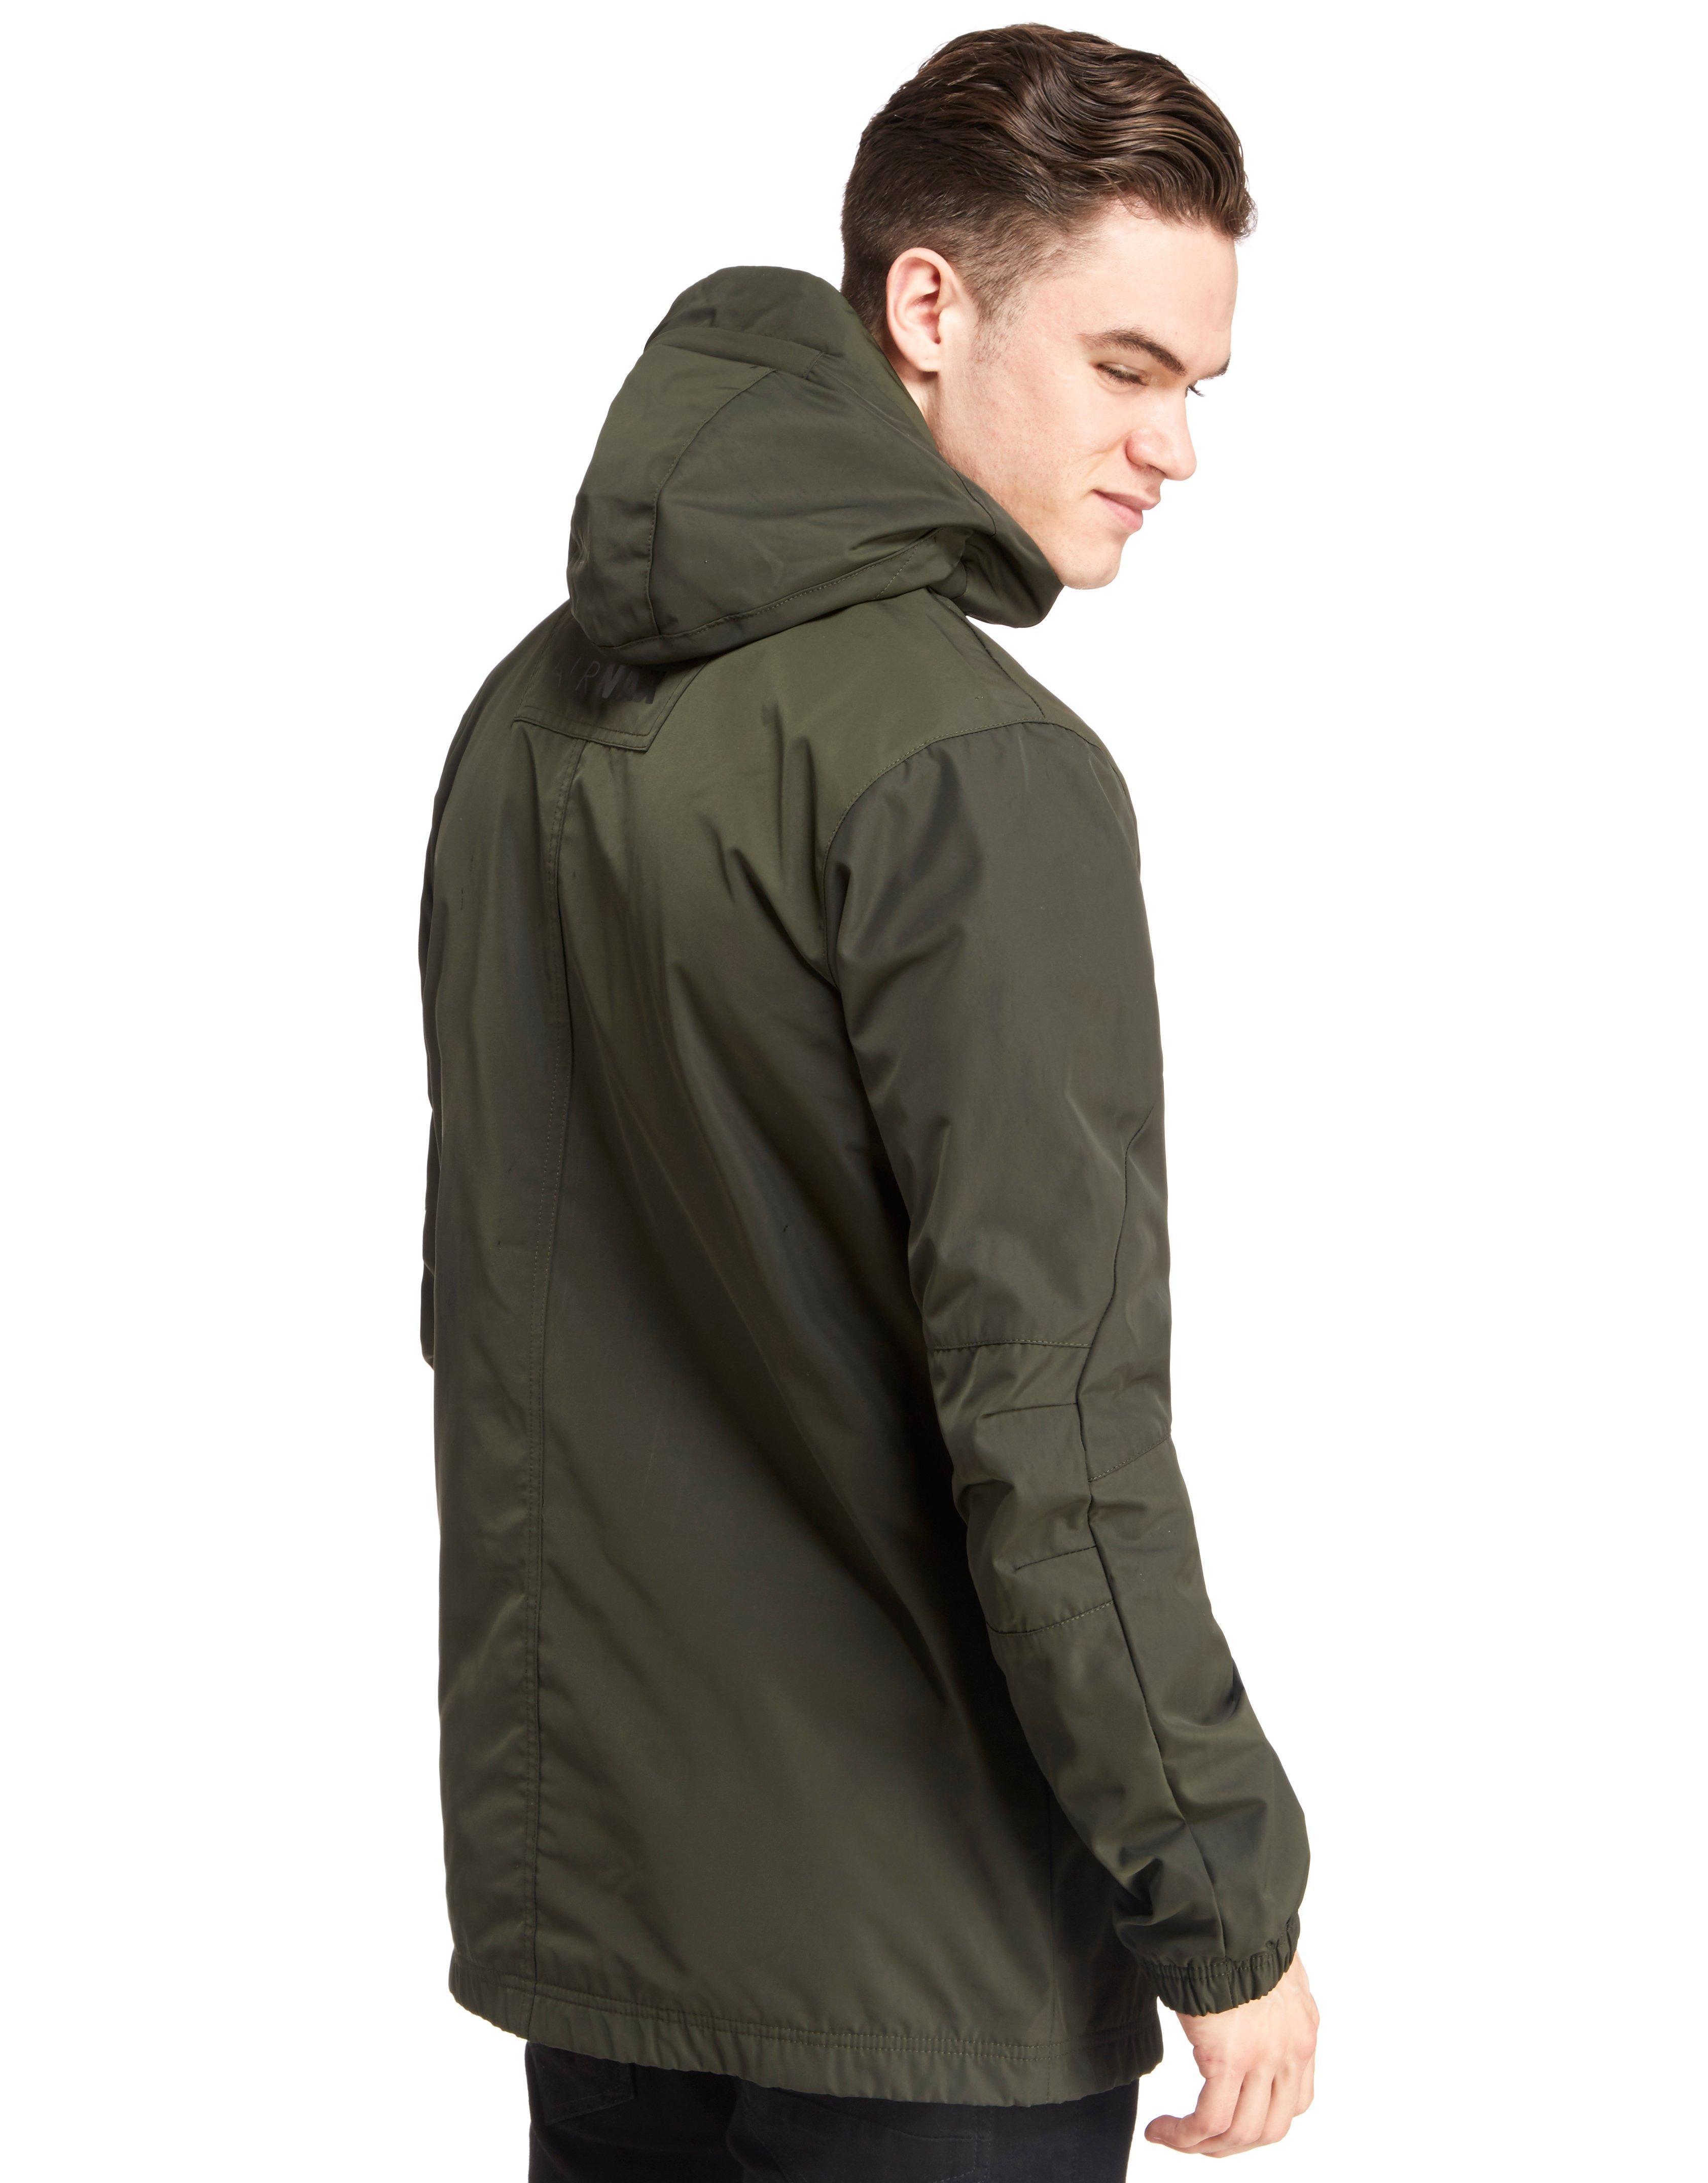 lyst nike air max half zip chevron jacket for men. Black Bedroom Furniture Sets. Home Design Ideas